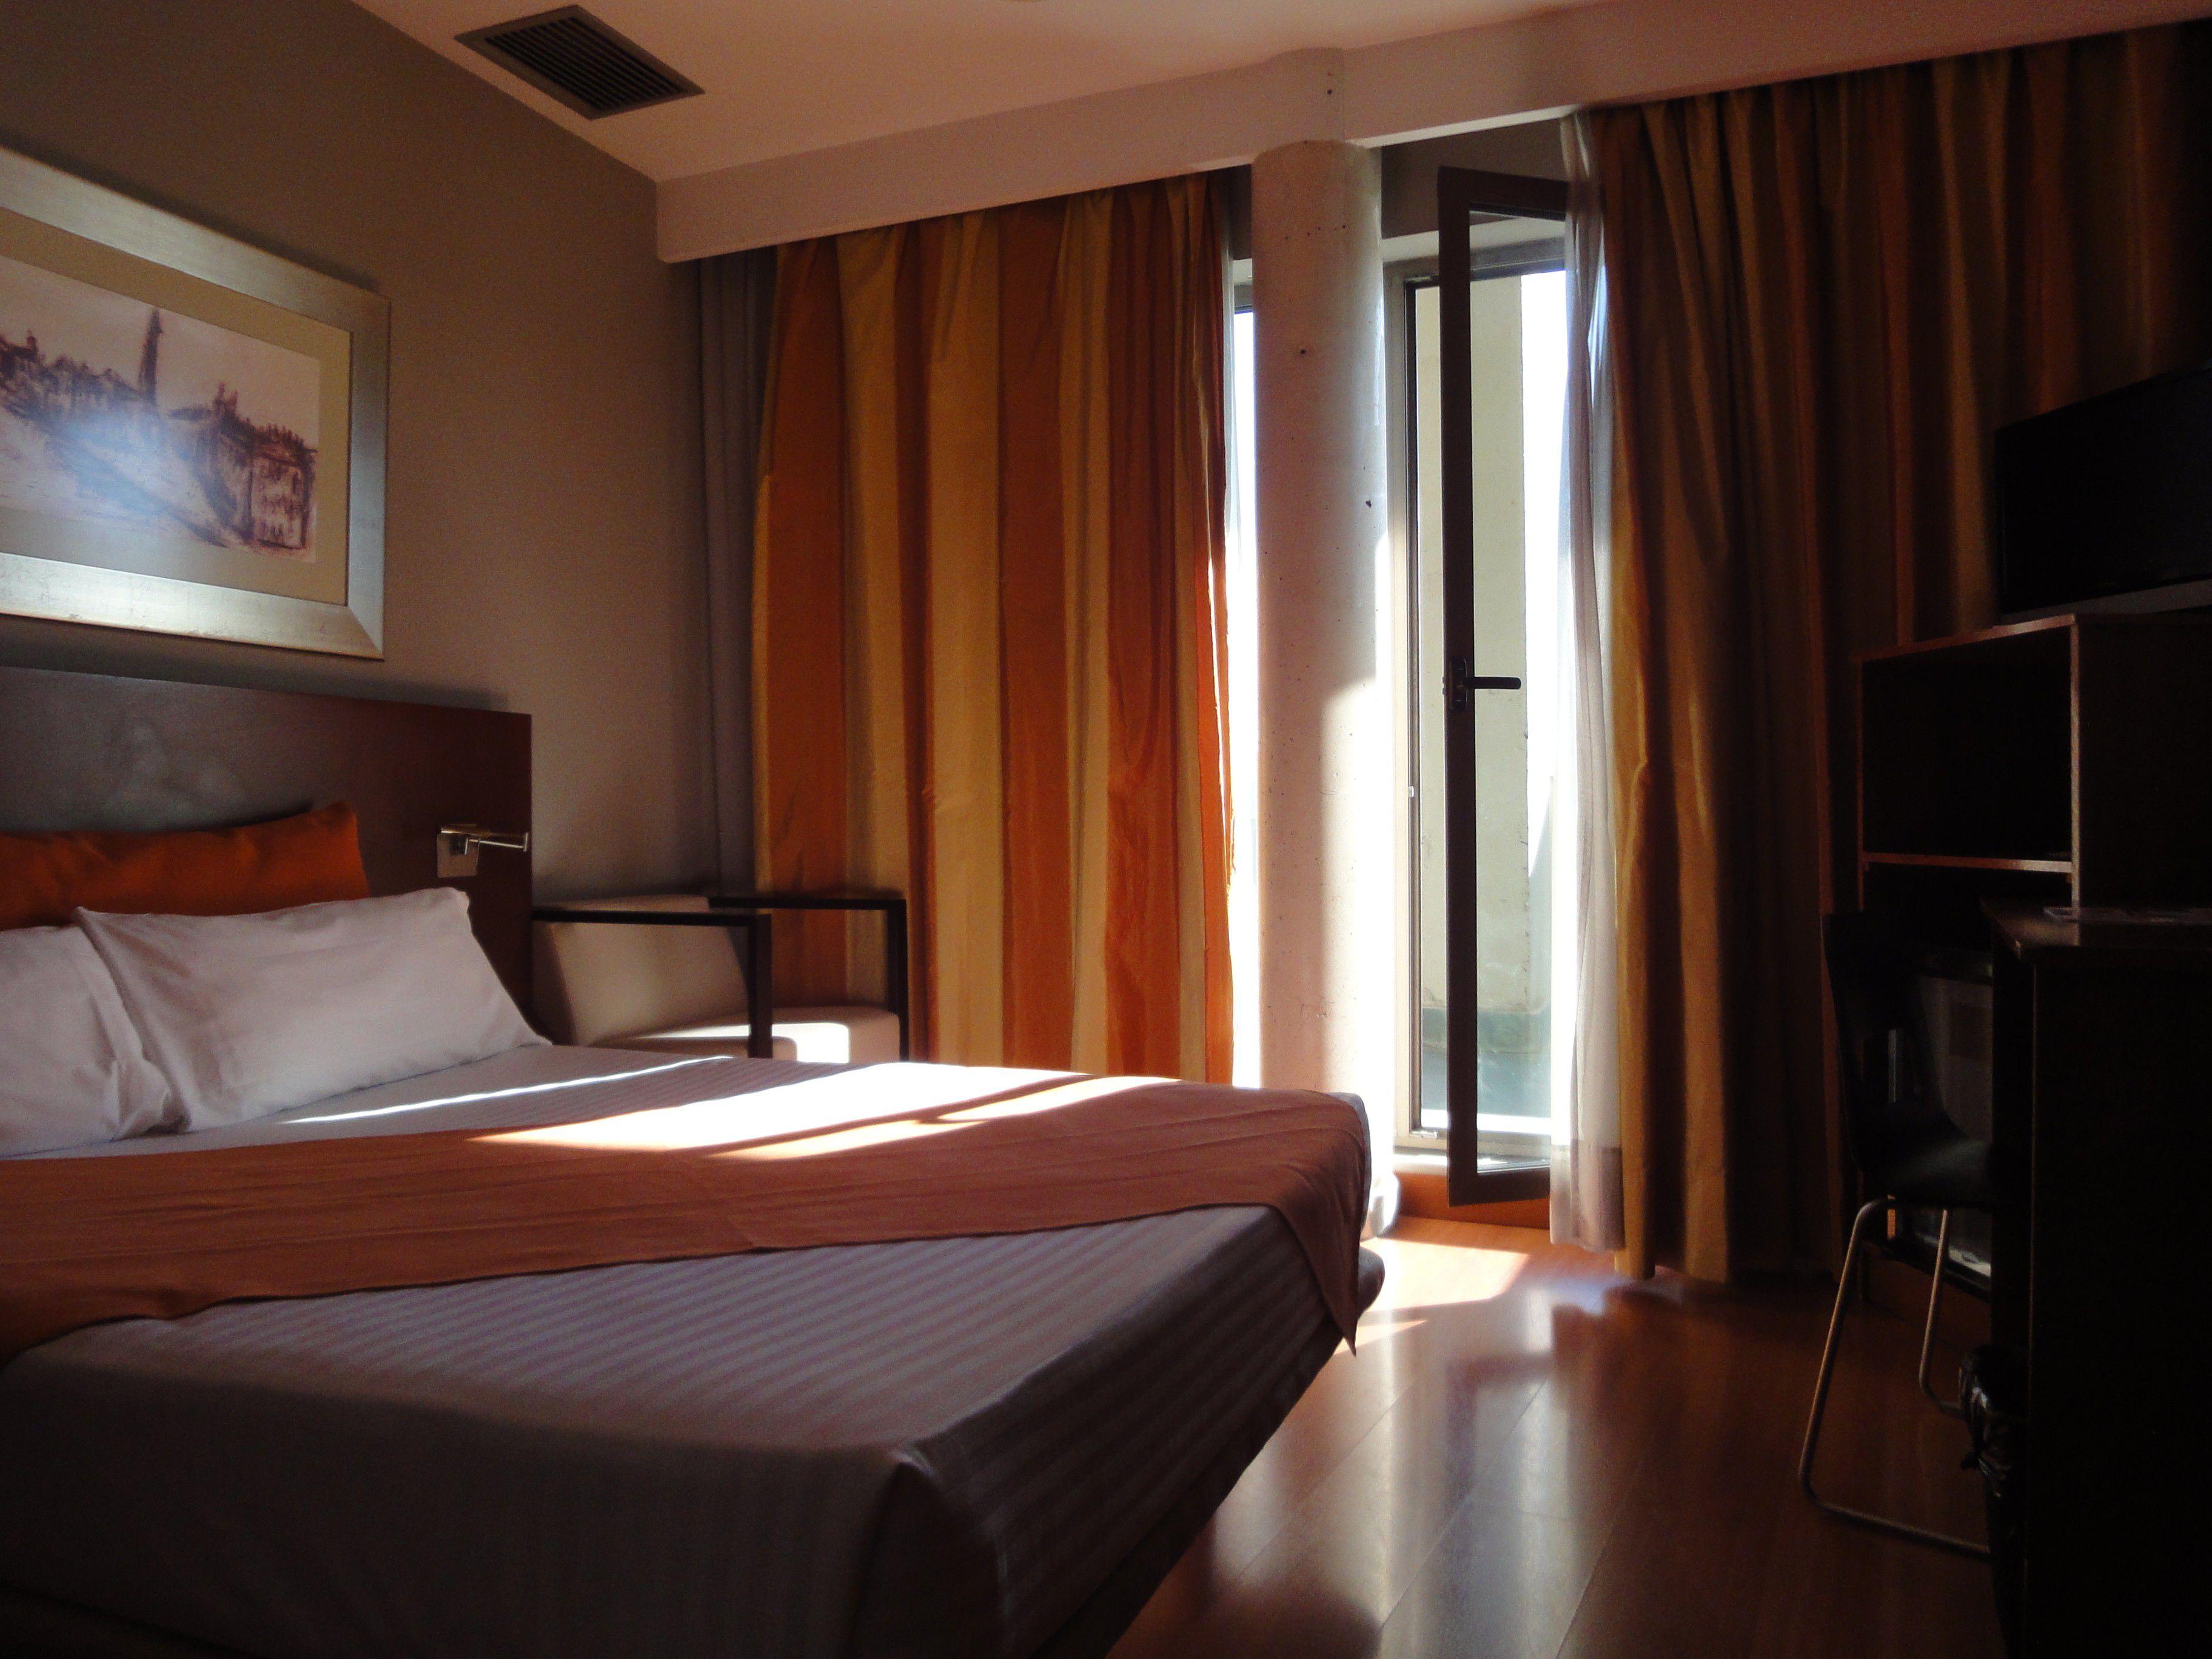 Petit Terrace del hotel Eurohotel Barcelona Gran Via Fira